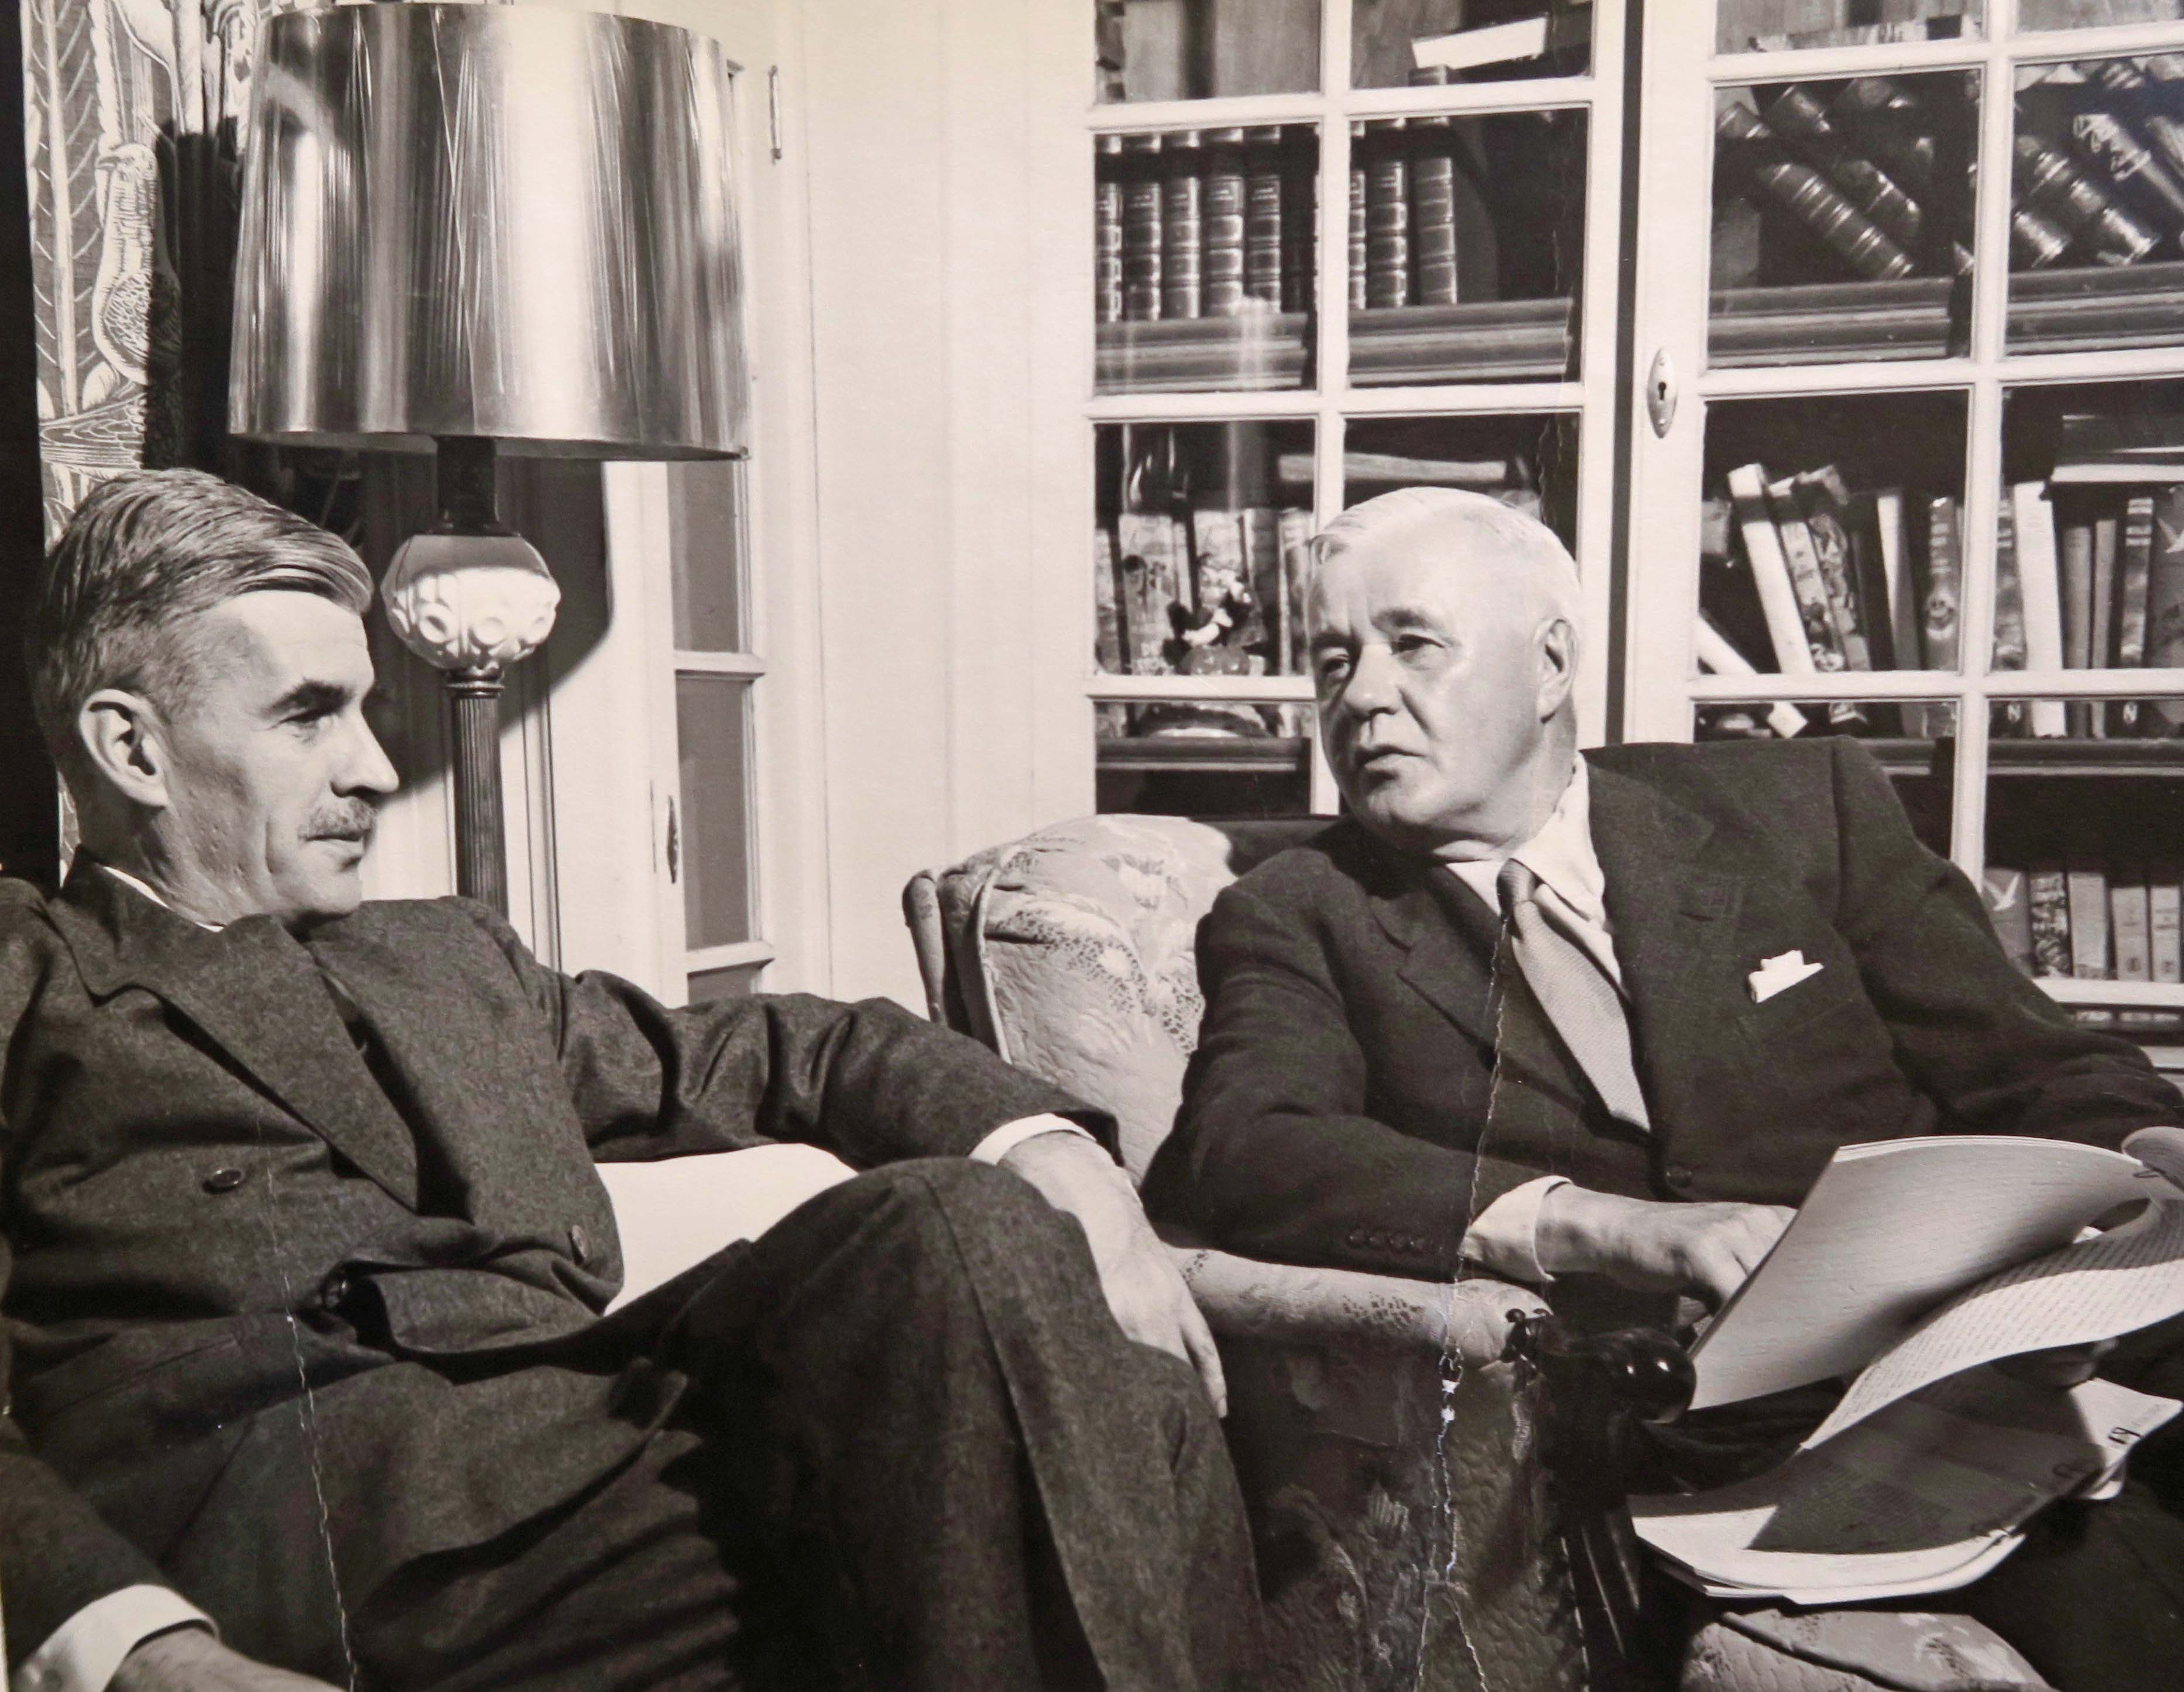 Edison Marshall and his Agent Paul Reynolds